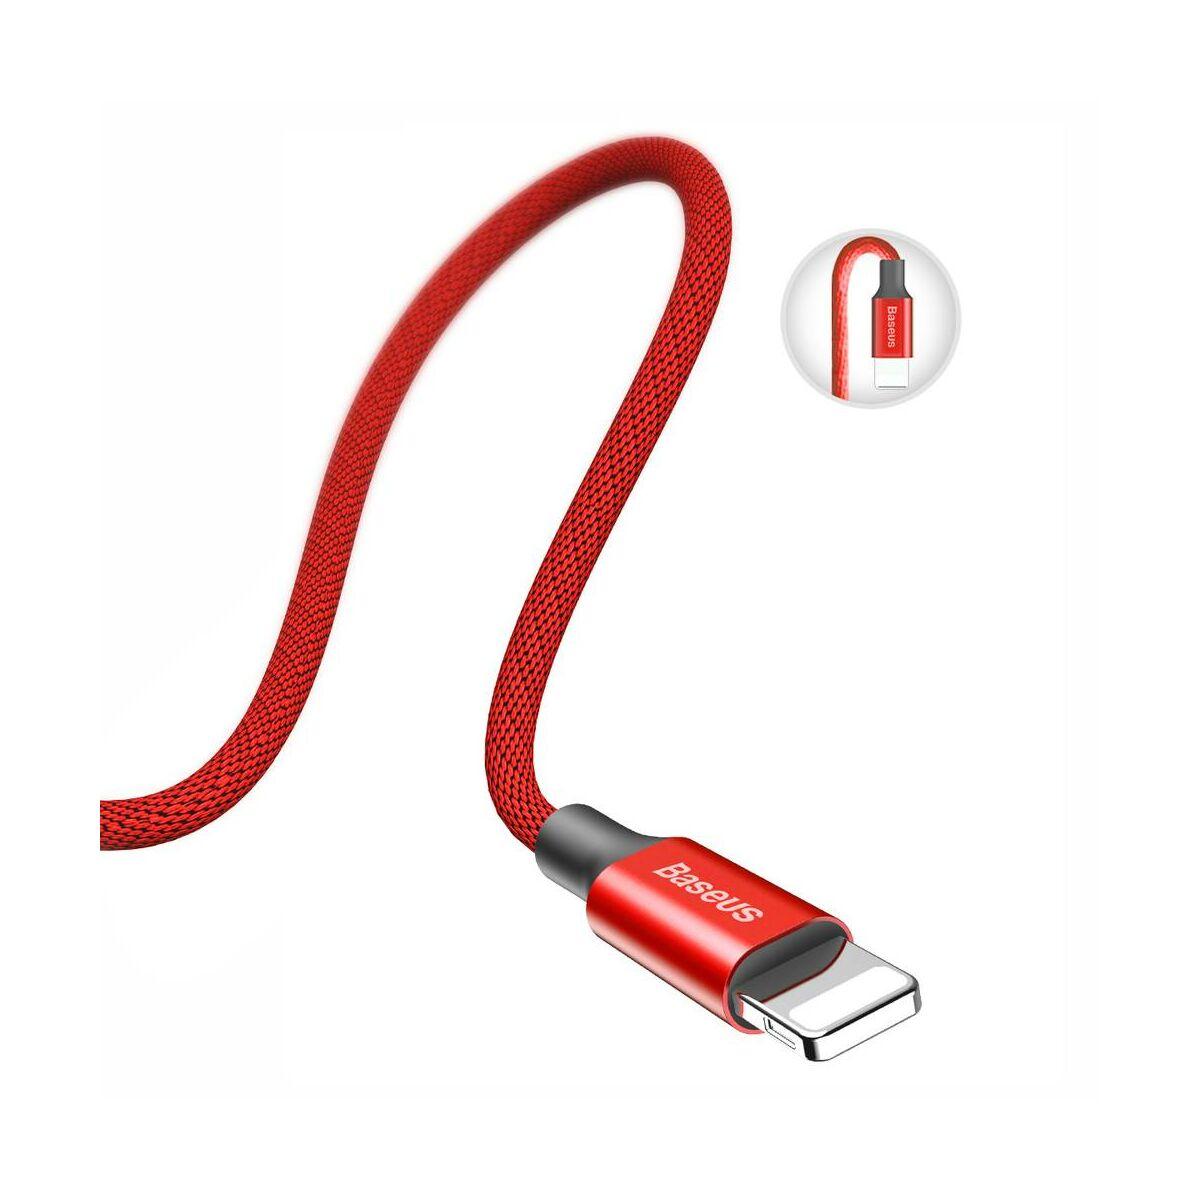 Baseus Lightning kábel, Yiven 2A, 1.2m, piros (CALYW-09)